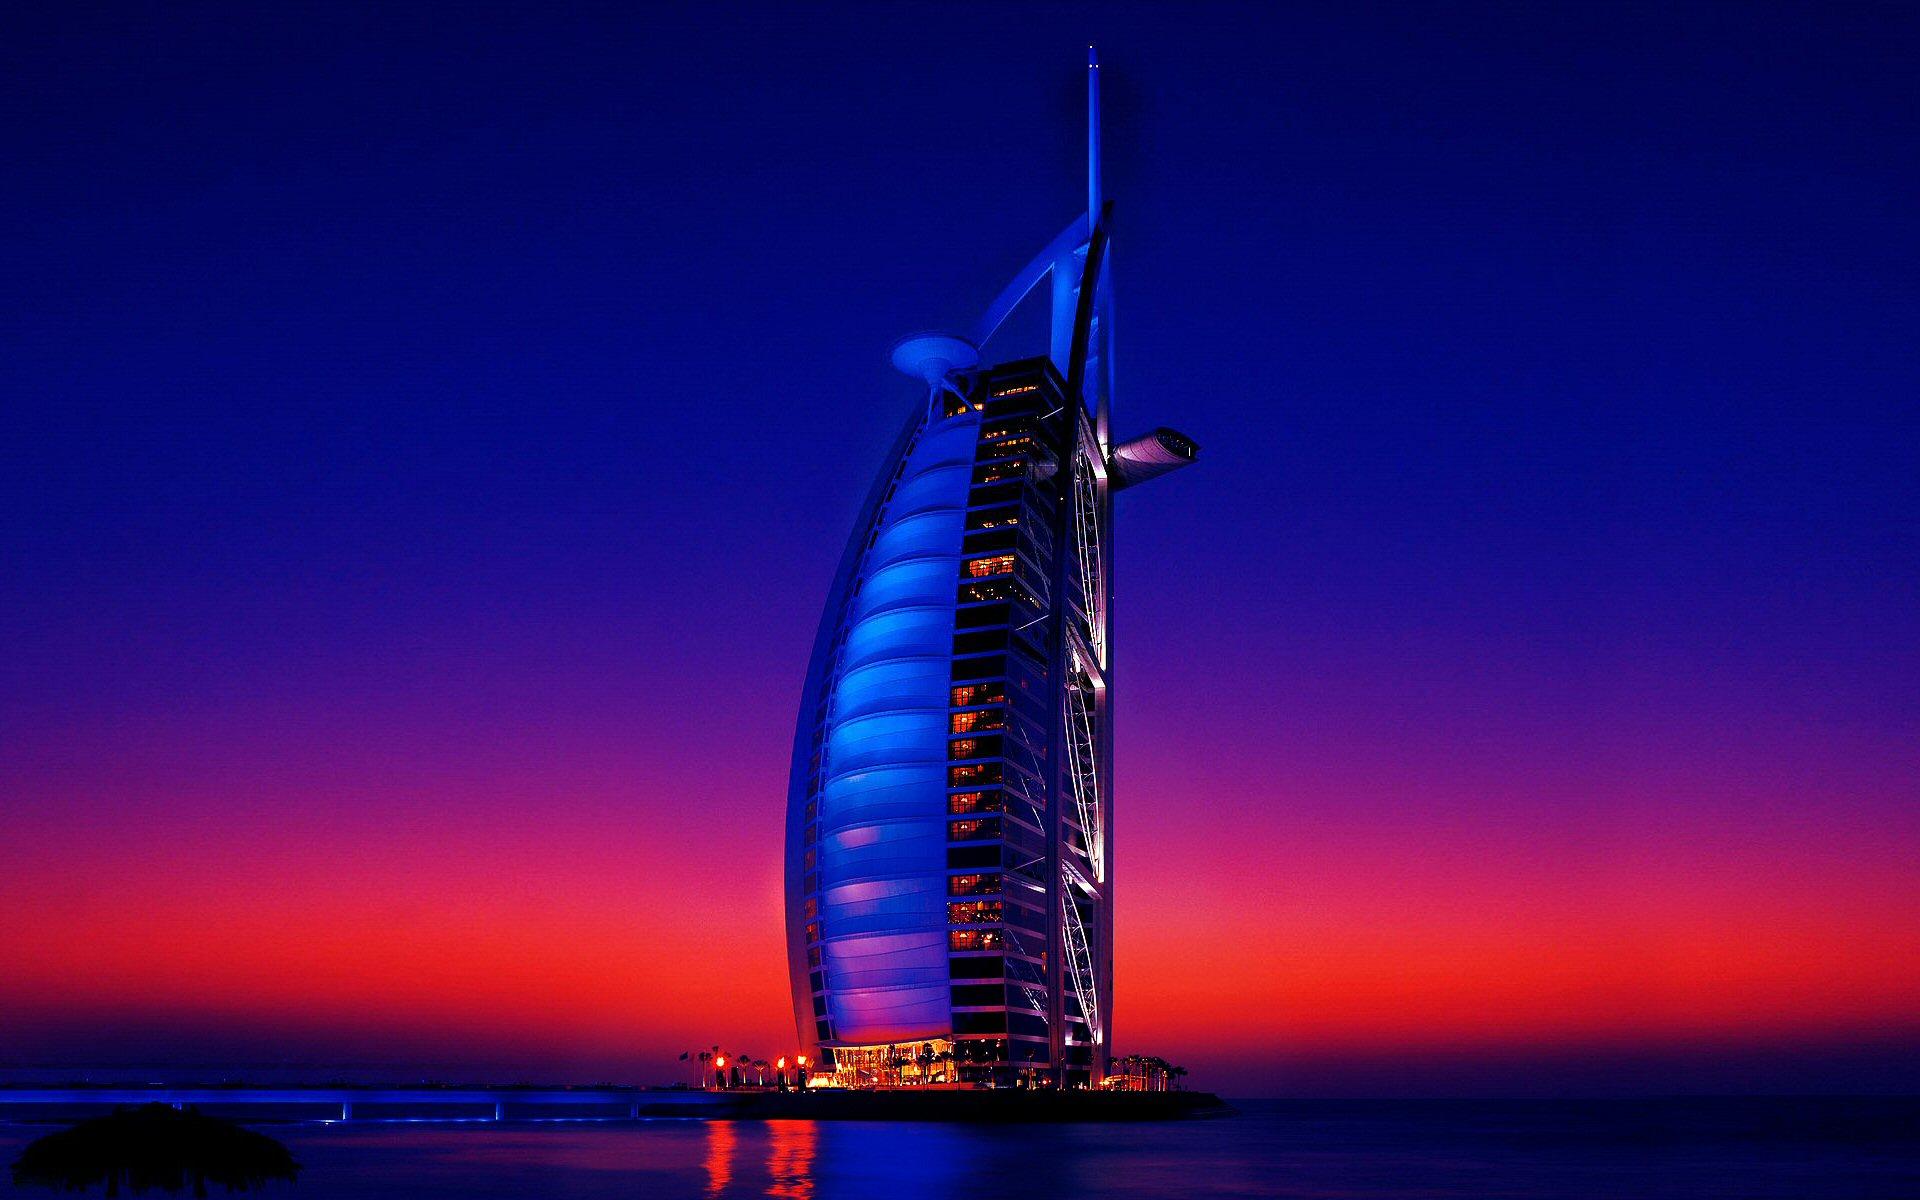 DUBAI SEAWING [02] Redhorizon [VersionOne465912